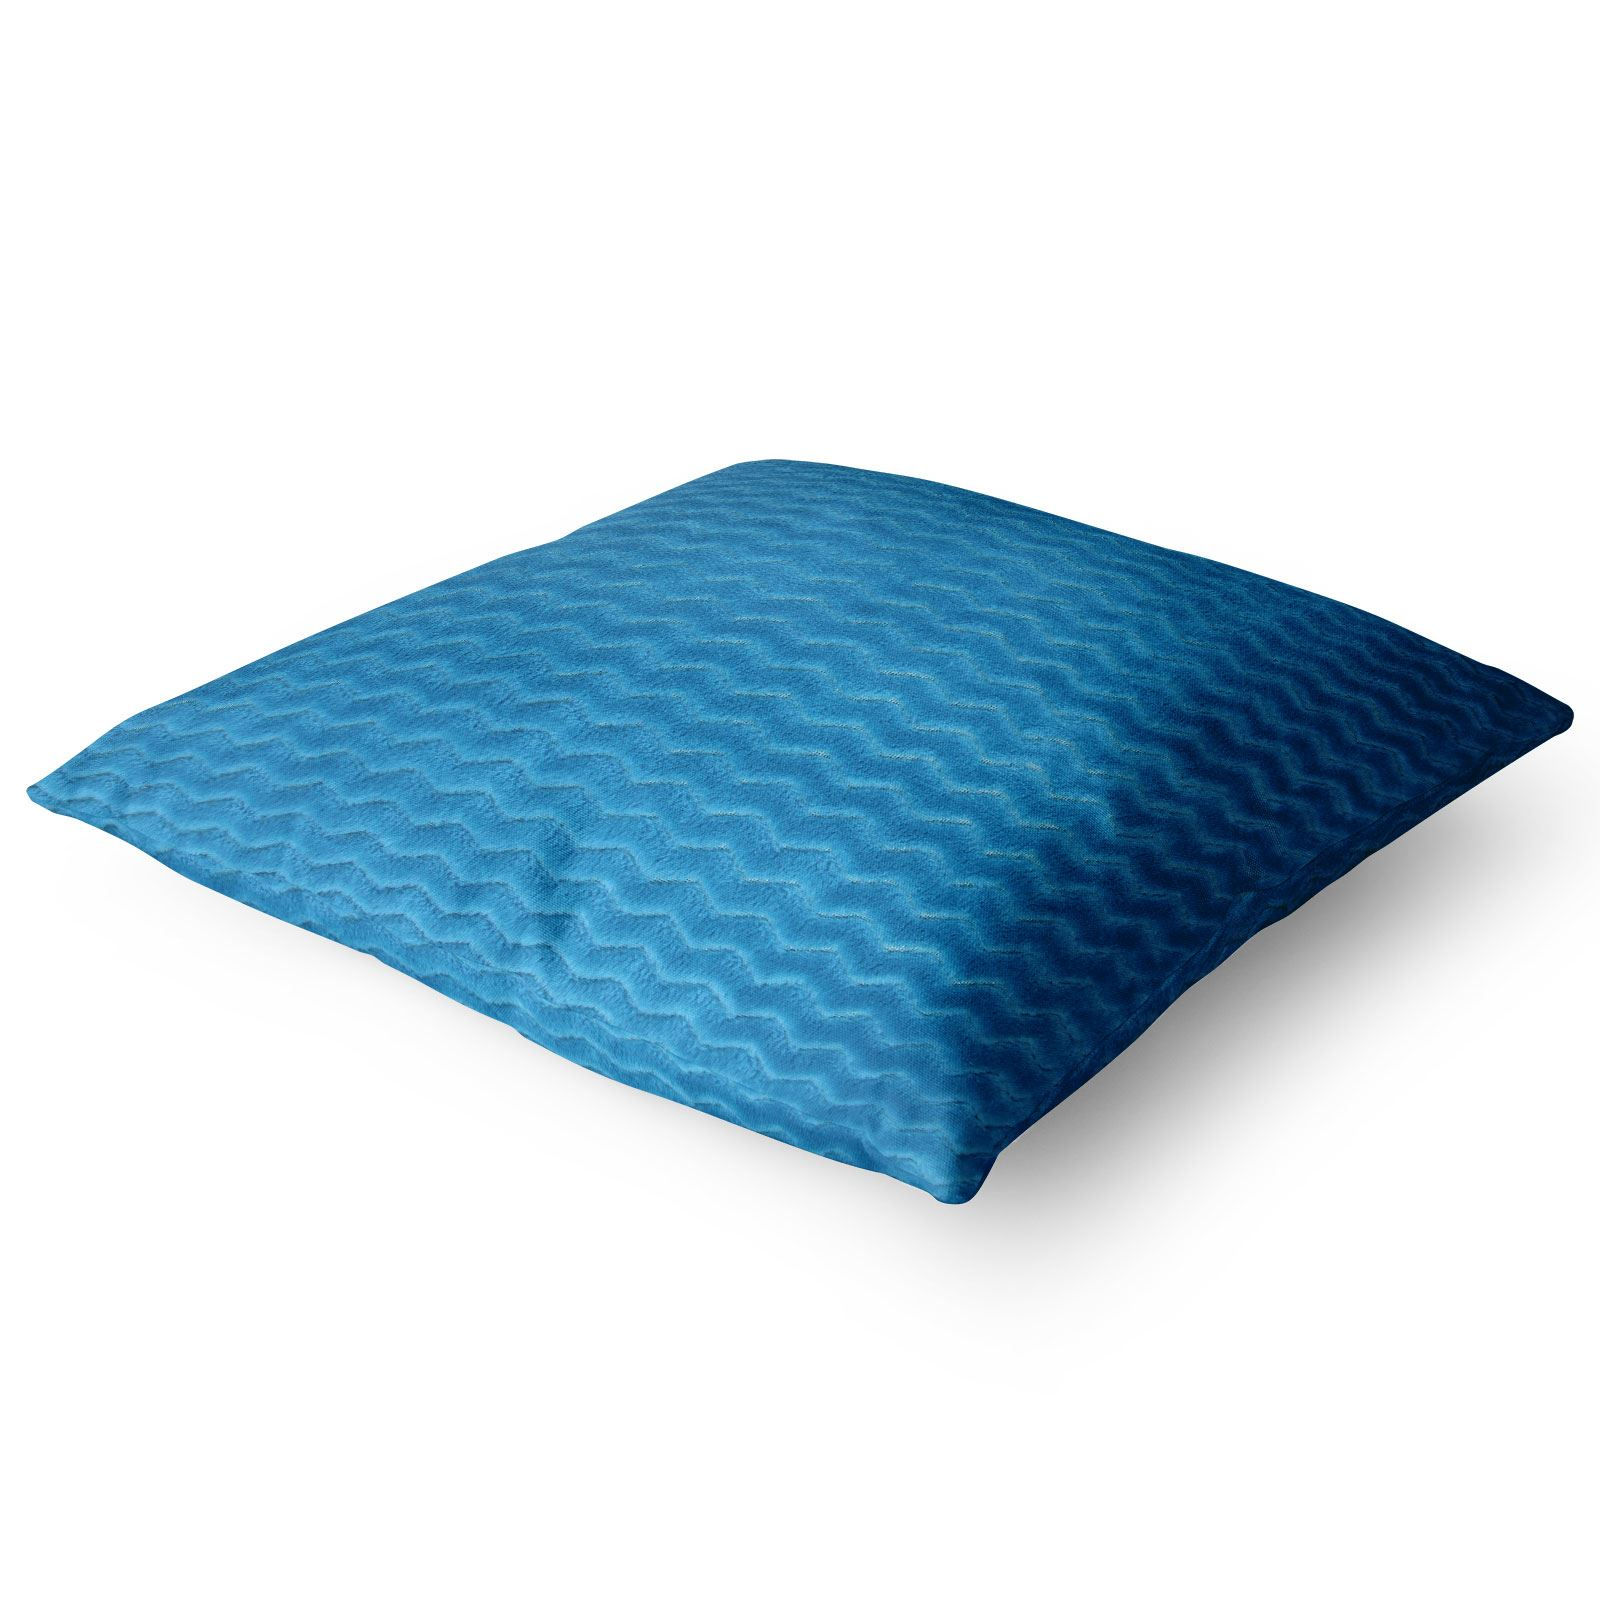 Teal-Blue-Duck-Egg-Cushion-Covers-18-034-x18-034-45cm-x-45cm-Luxury-Cover thumbnail 33